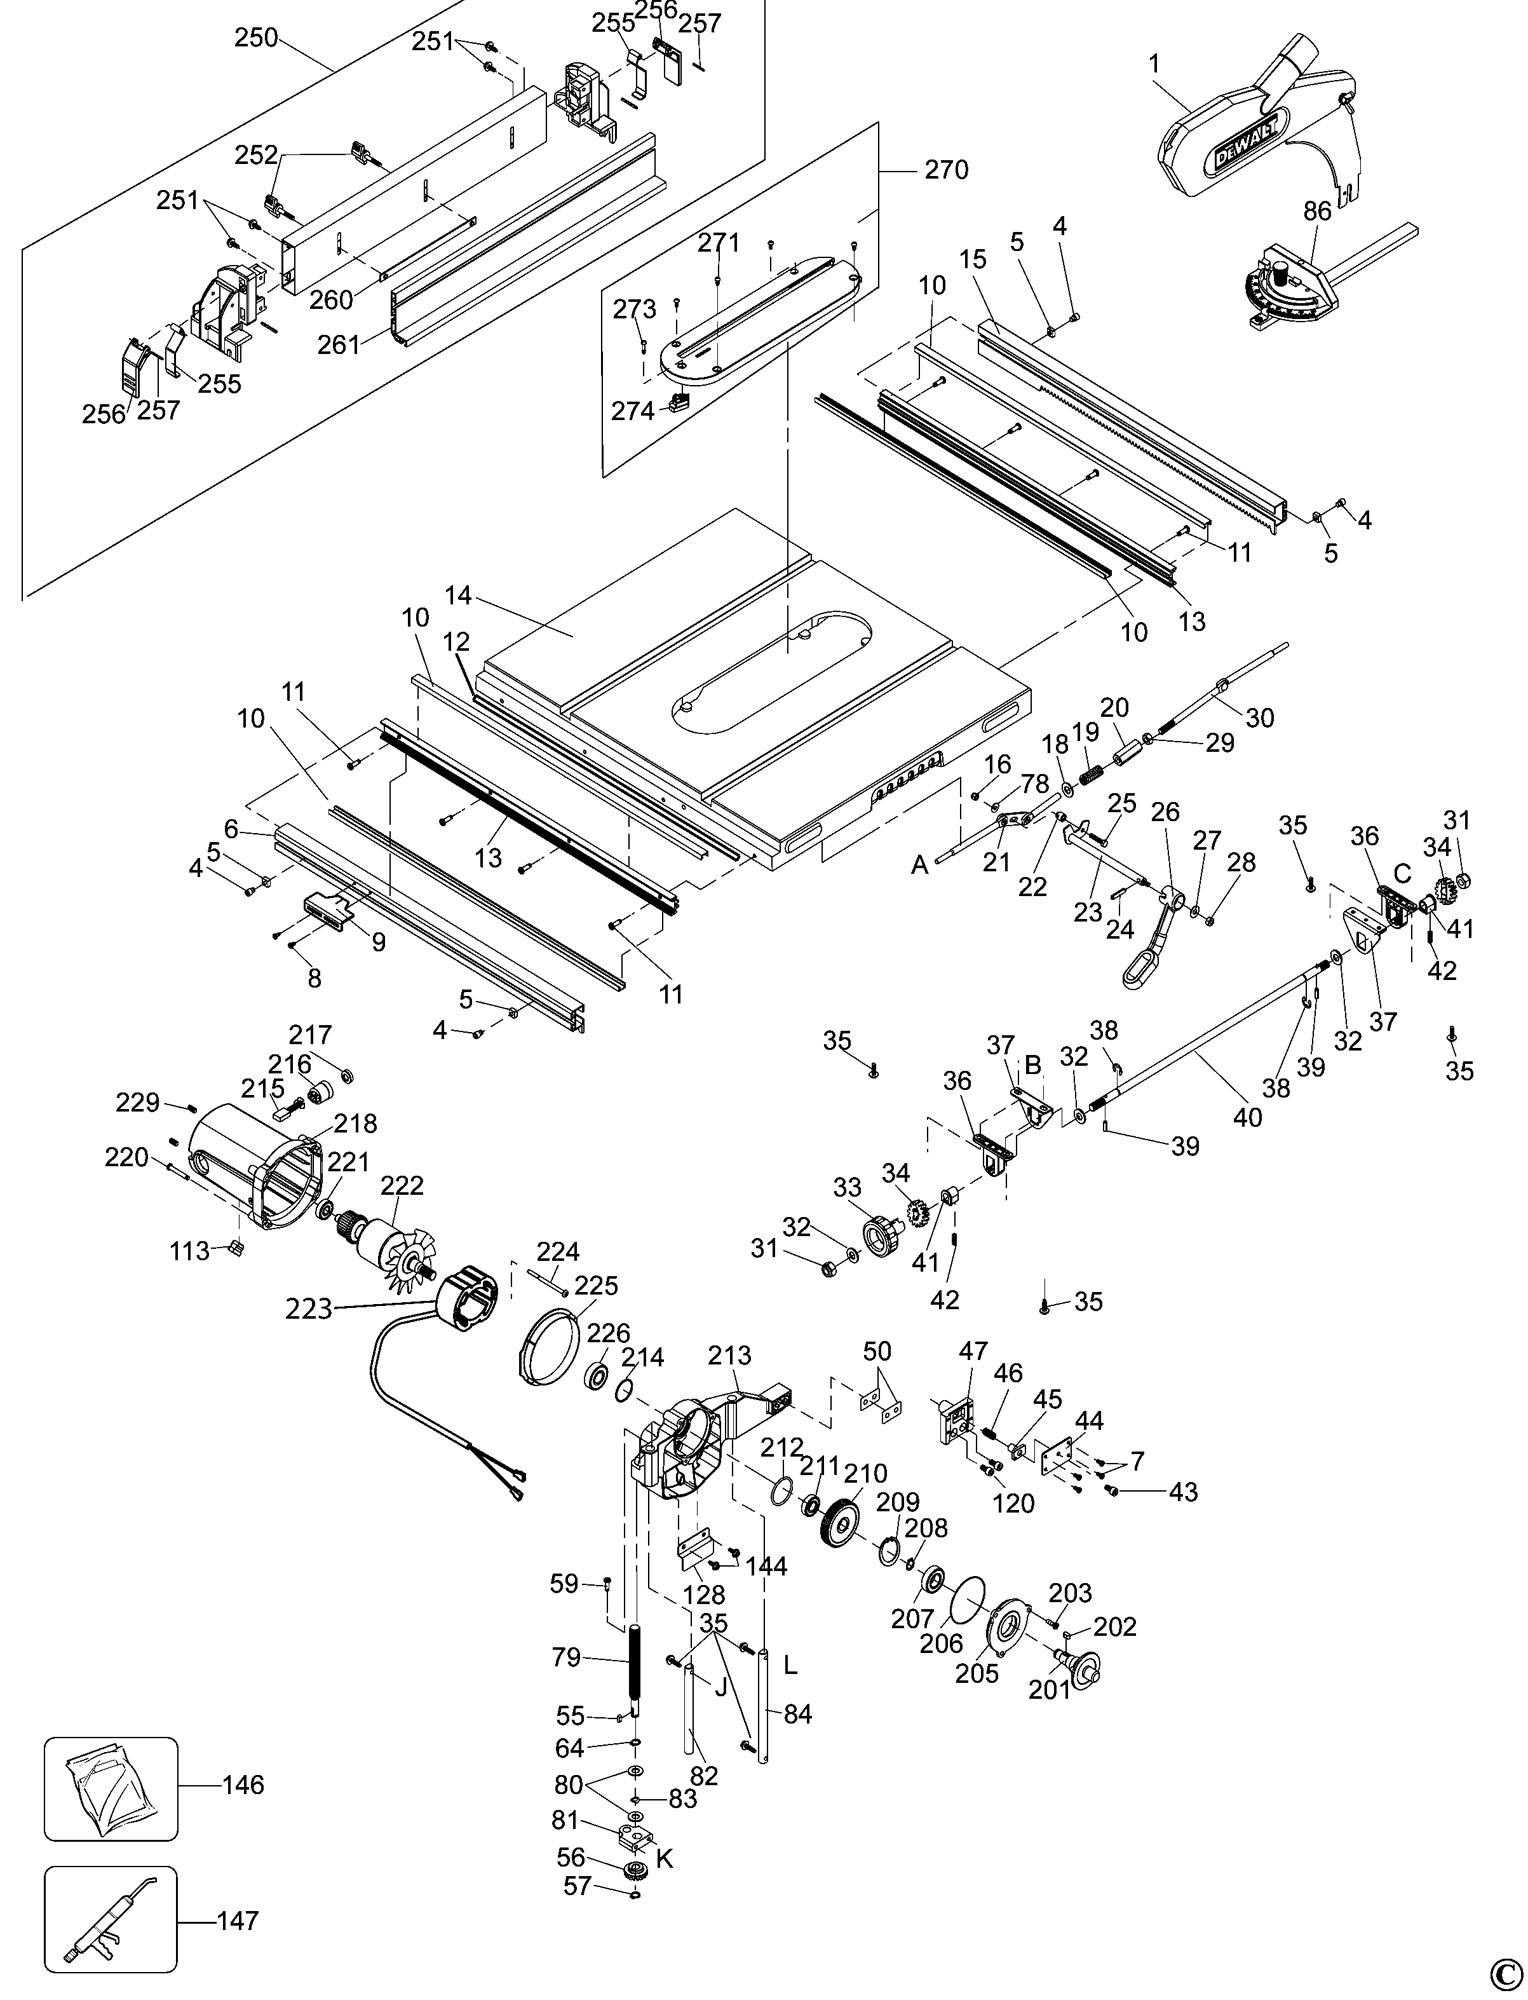 Spares For Dewalt Dw745 Table Saw Type 1 Spare Dw745